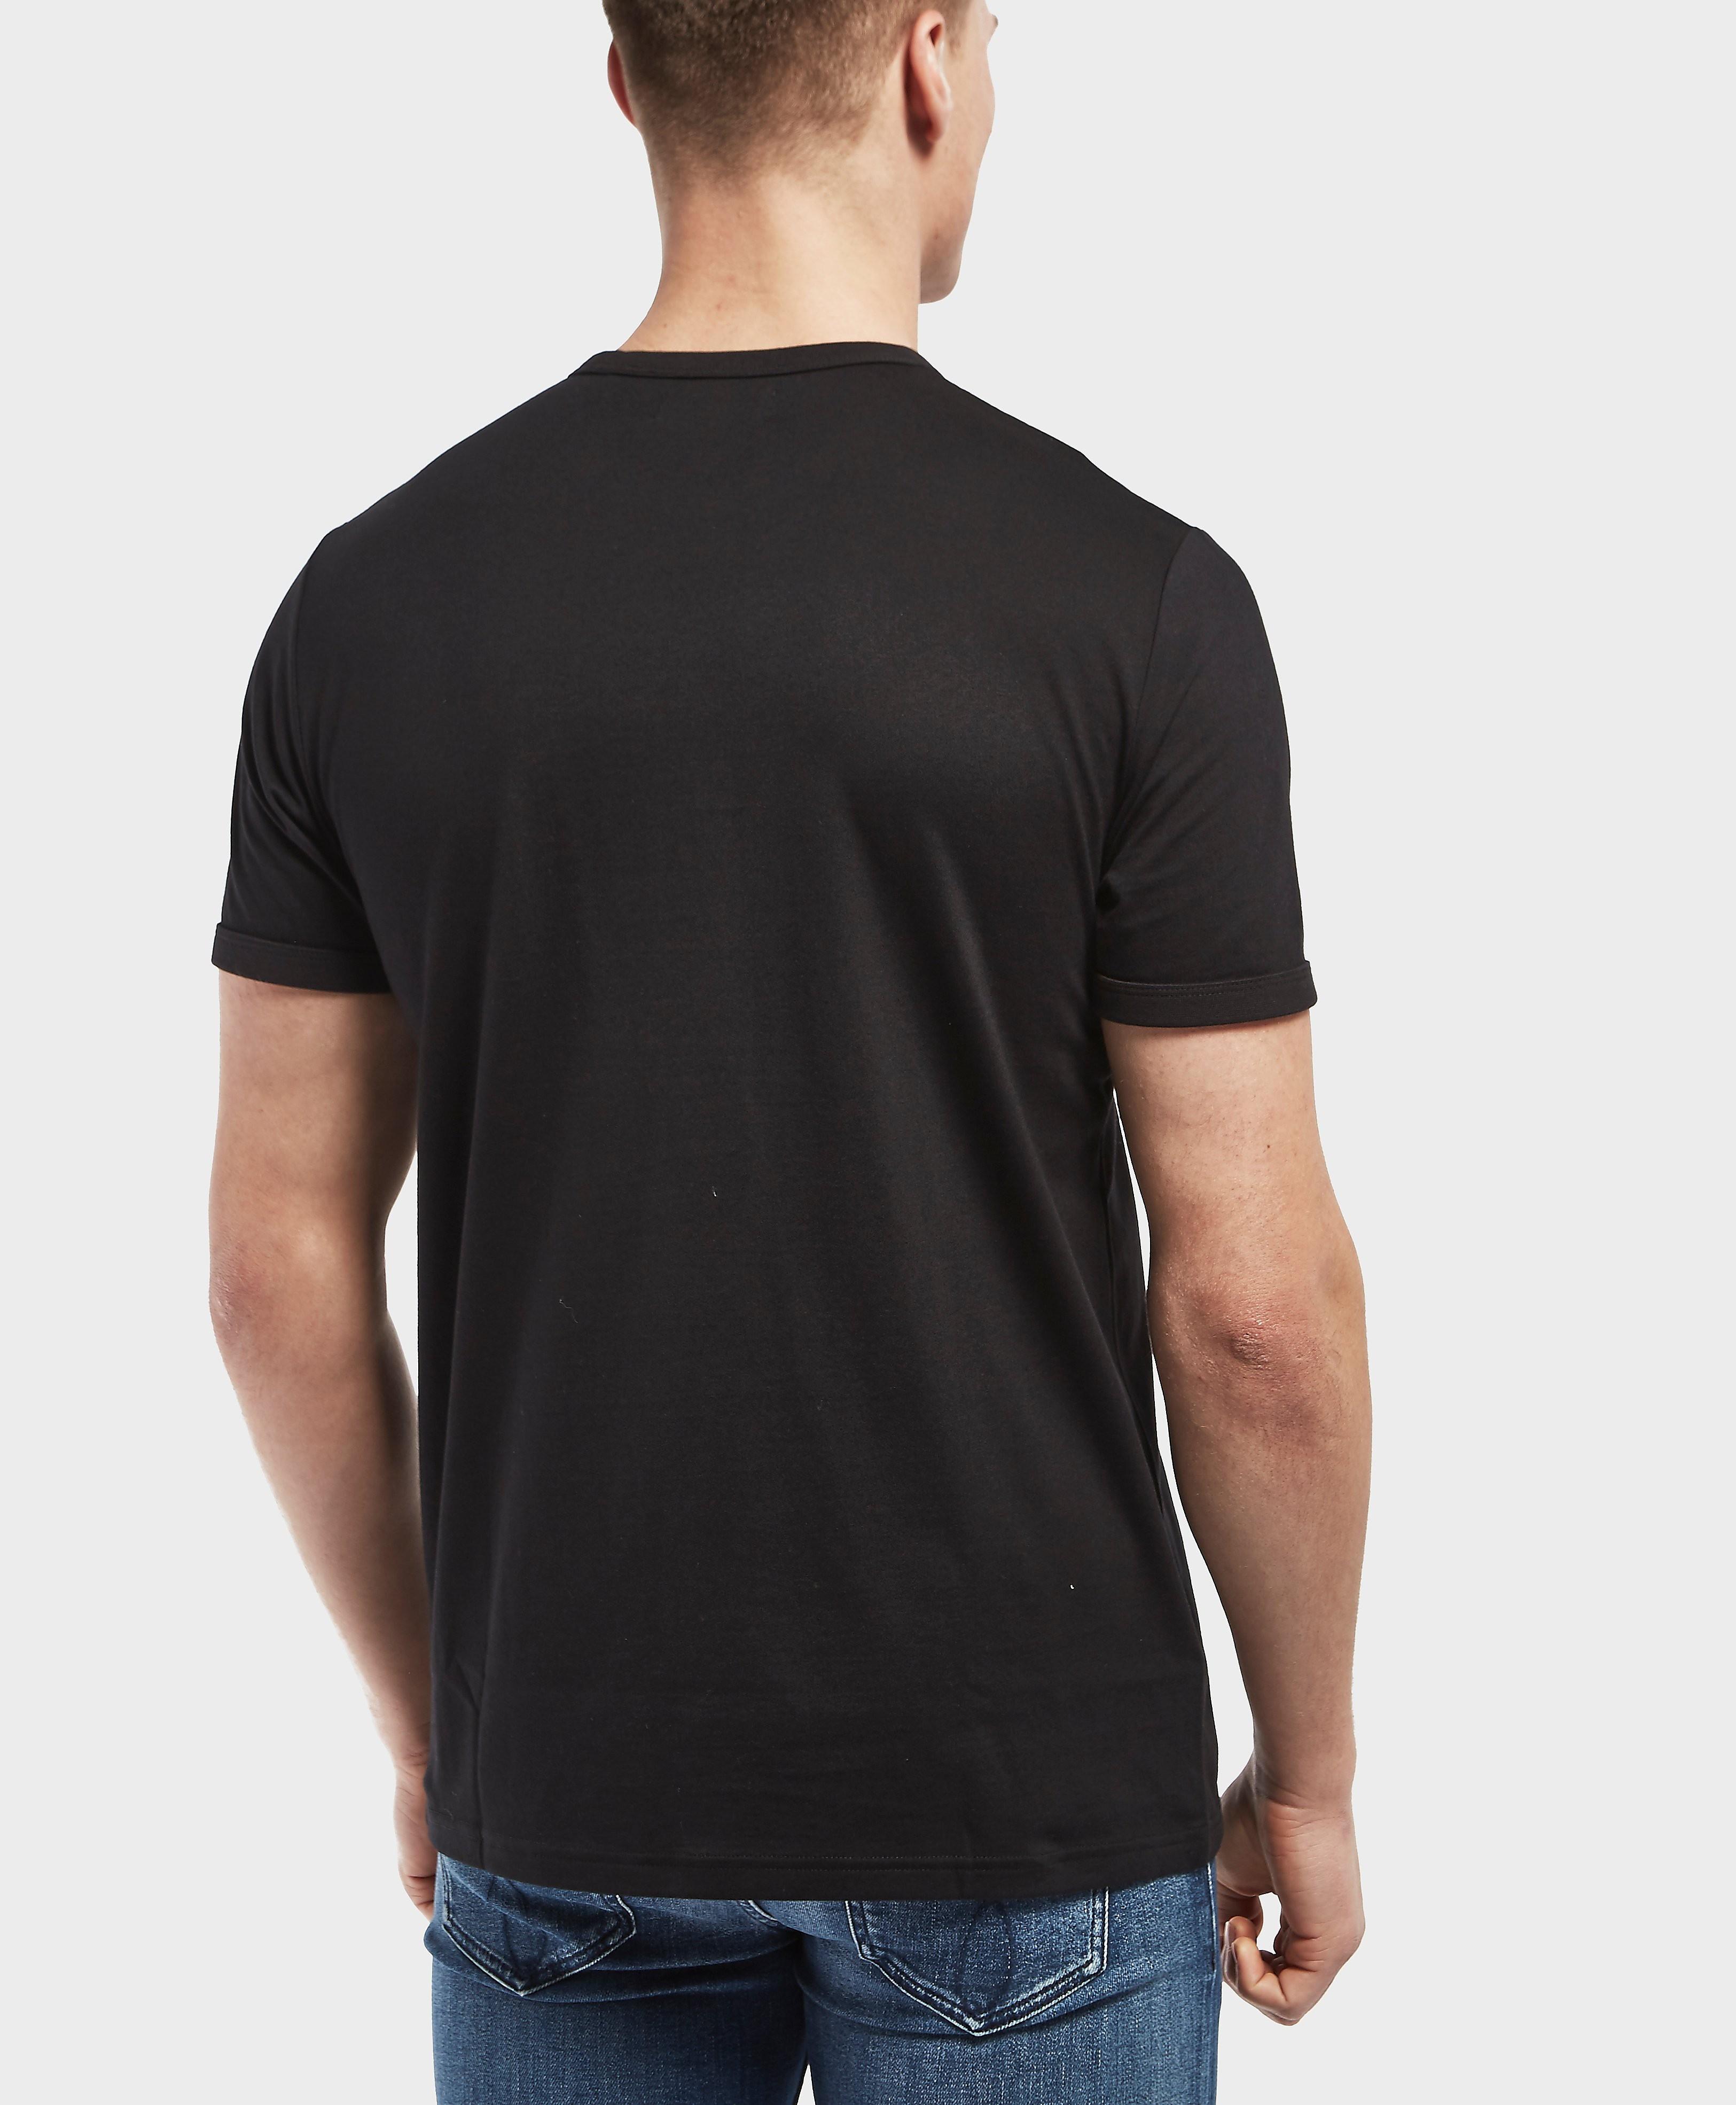 Fred Perry Laurel Box Logo Short Sleeve T-Shirt